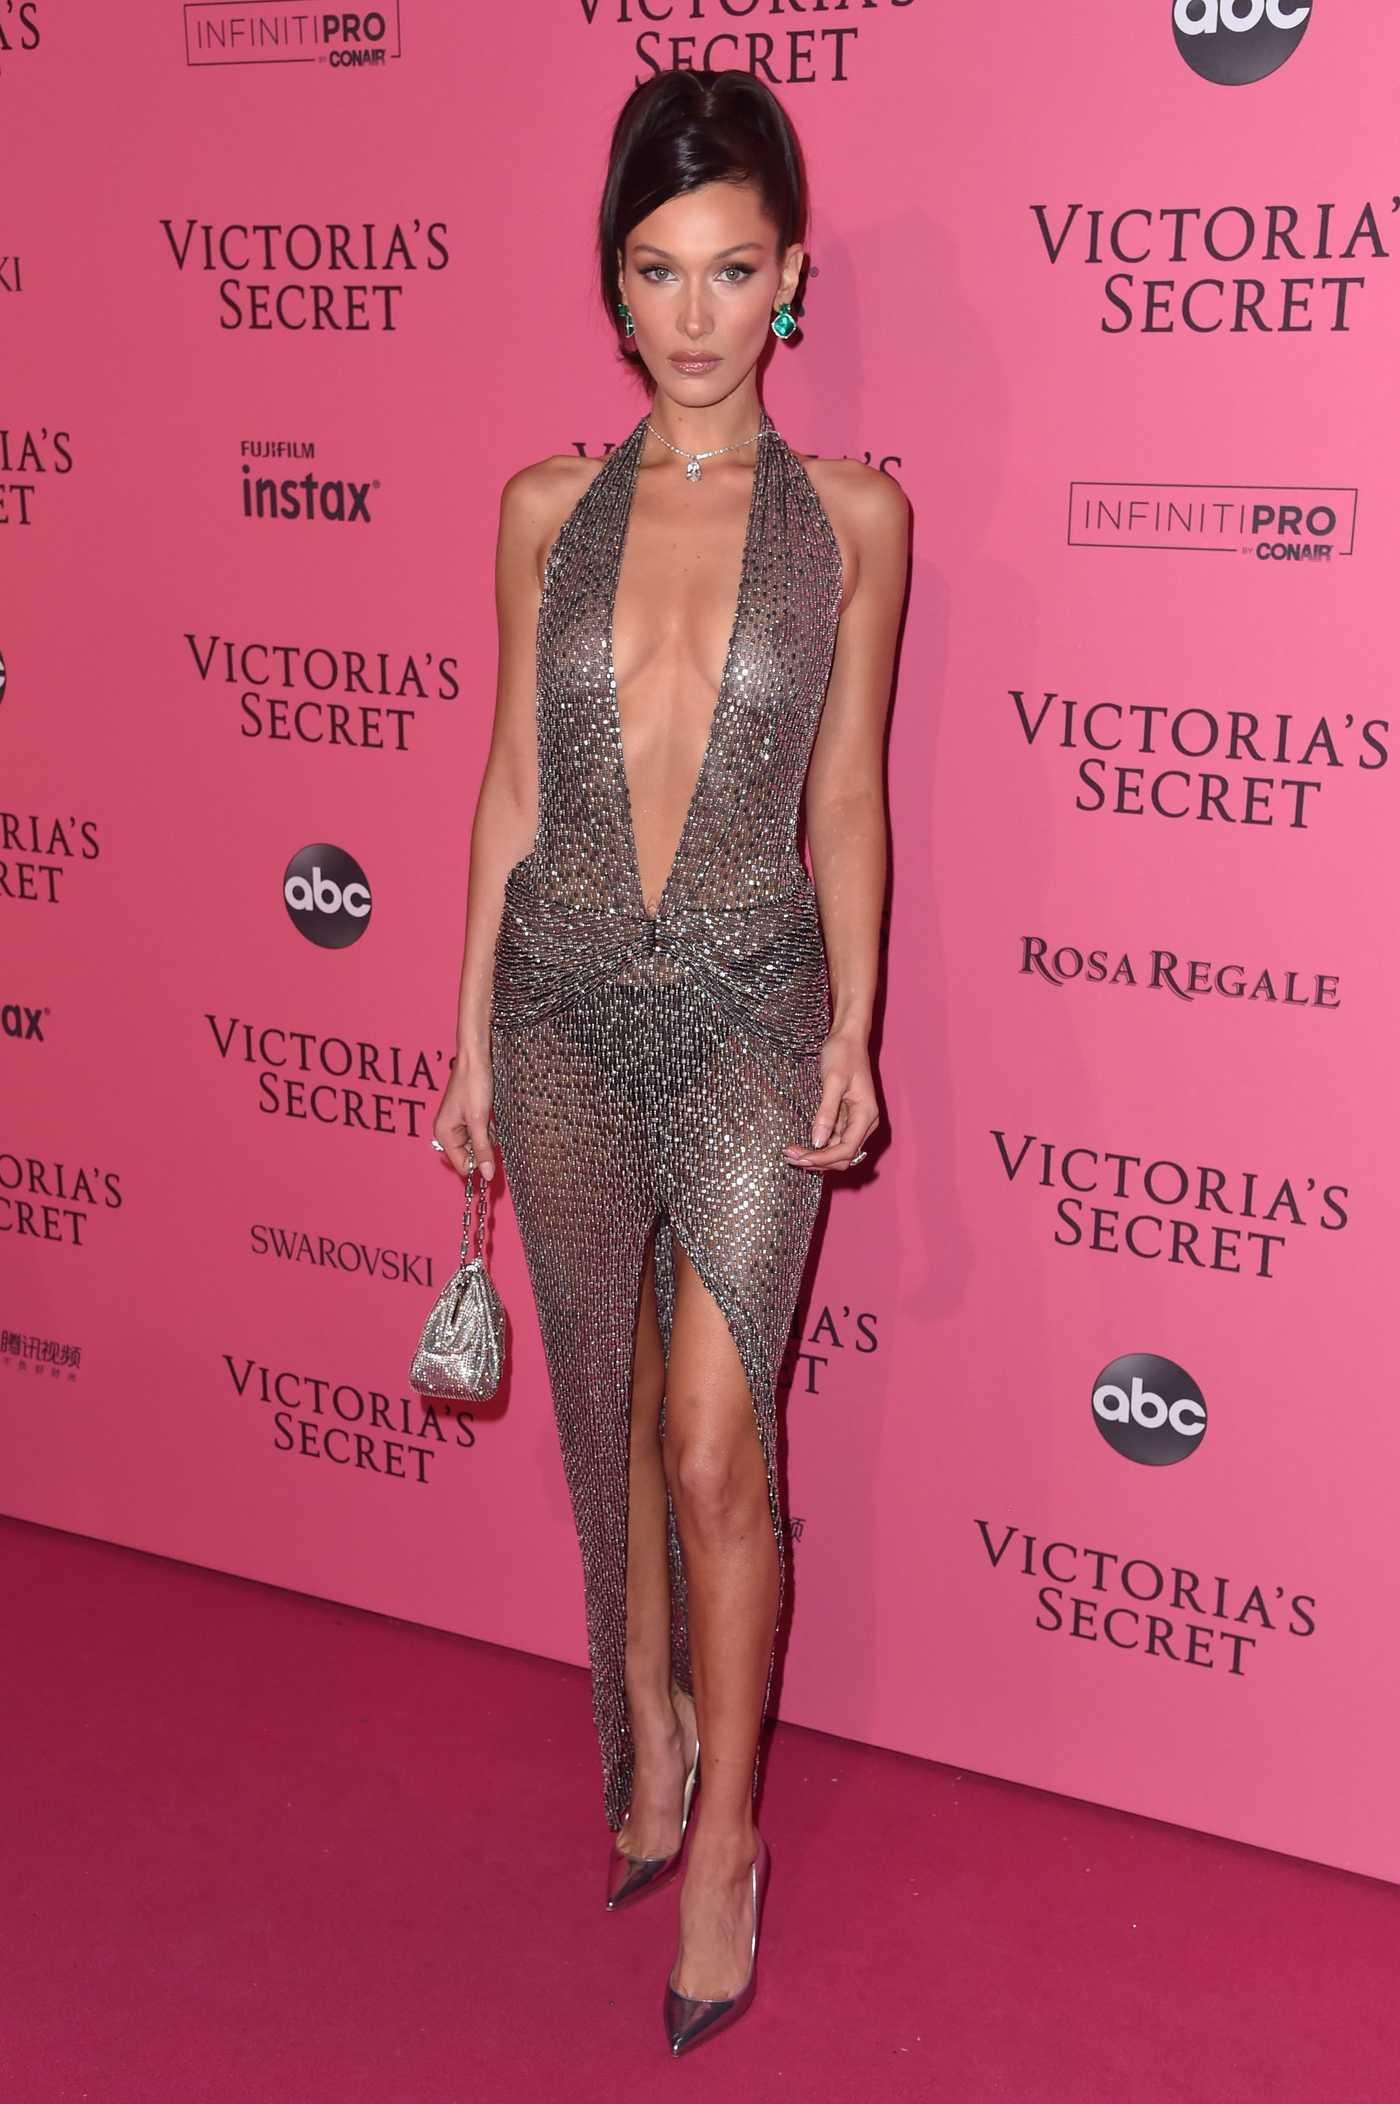 Bella Hadid Attends 2018 Victoria's Secret Fashion Show at Pier 94 in New York City 11/08/2018